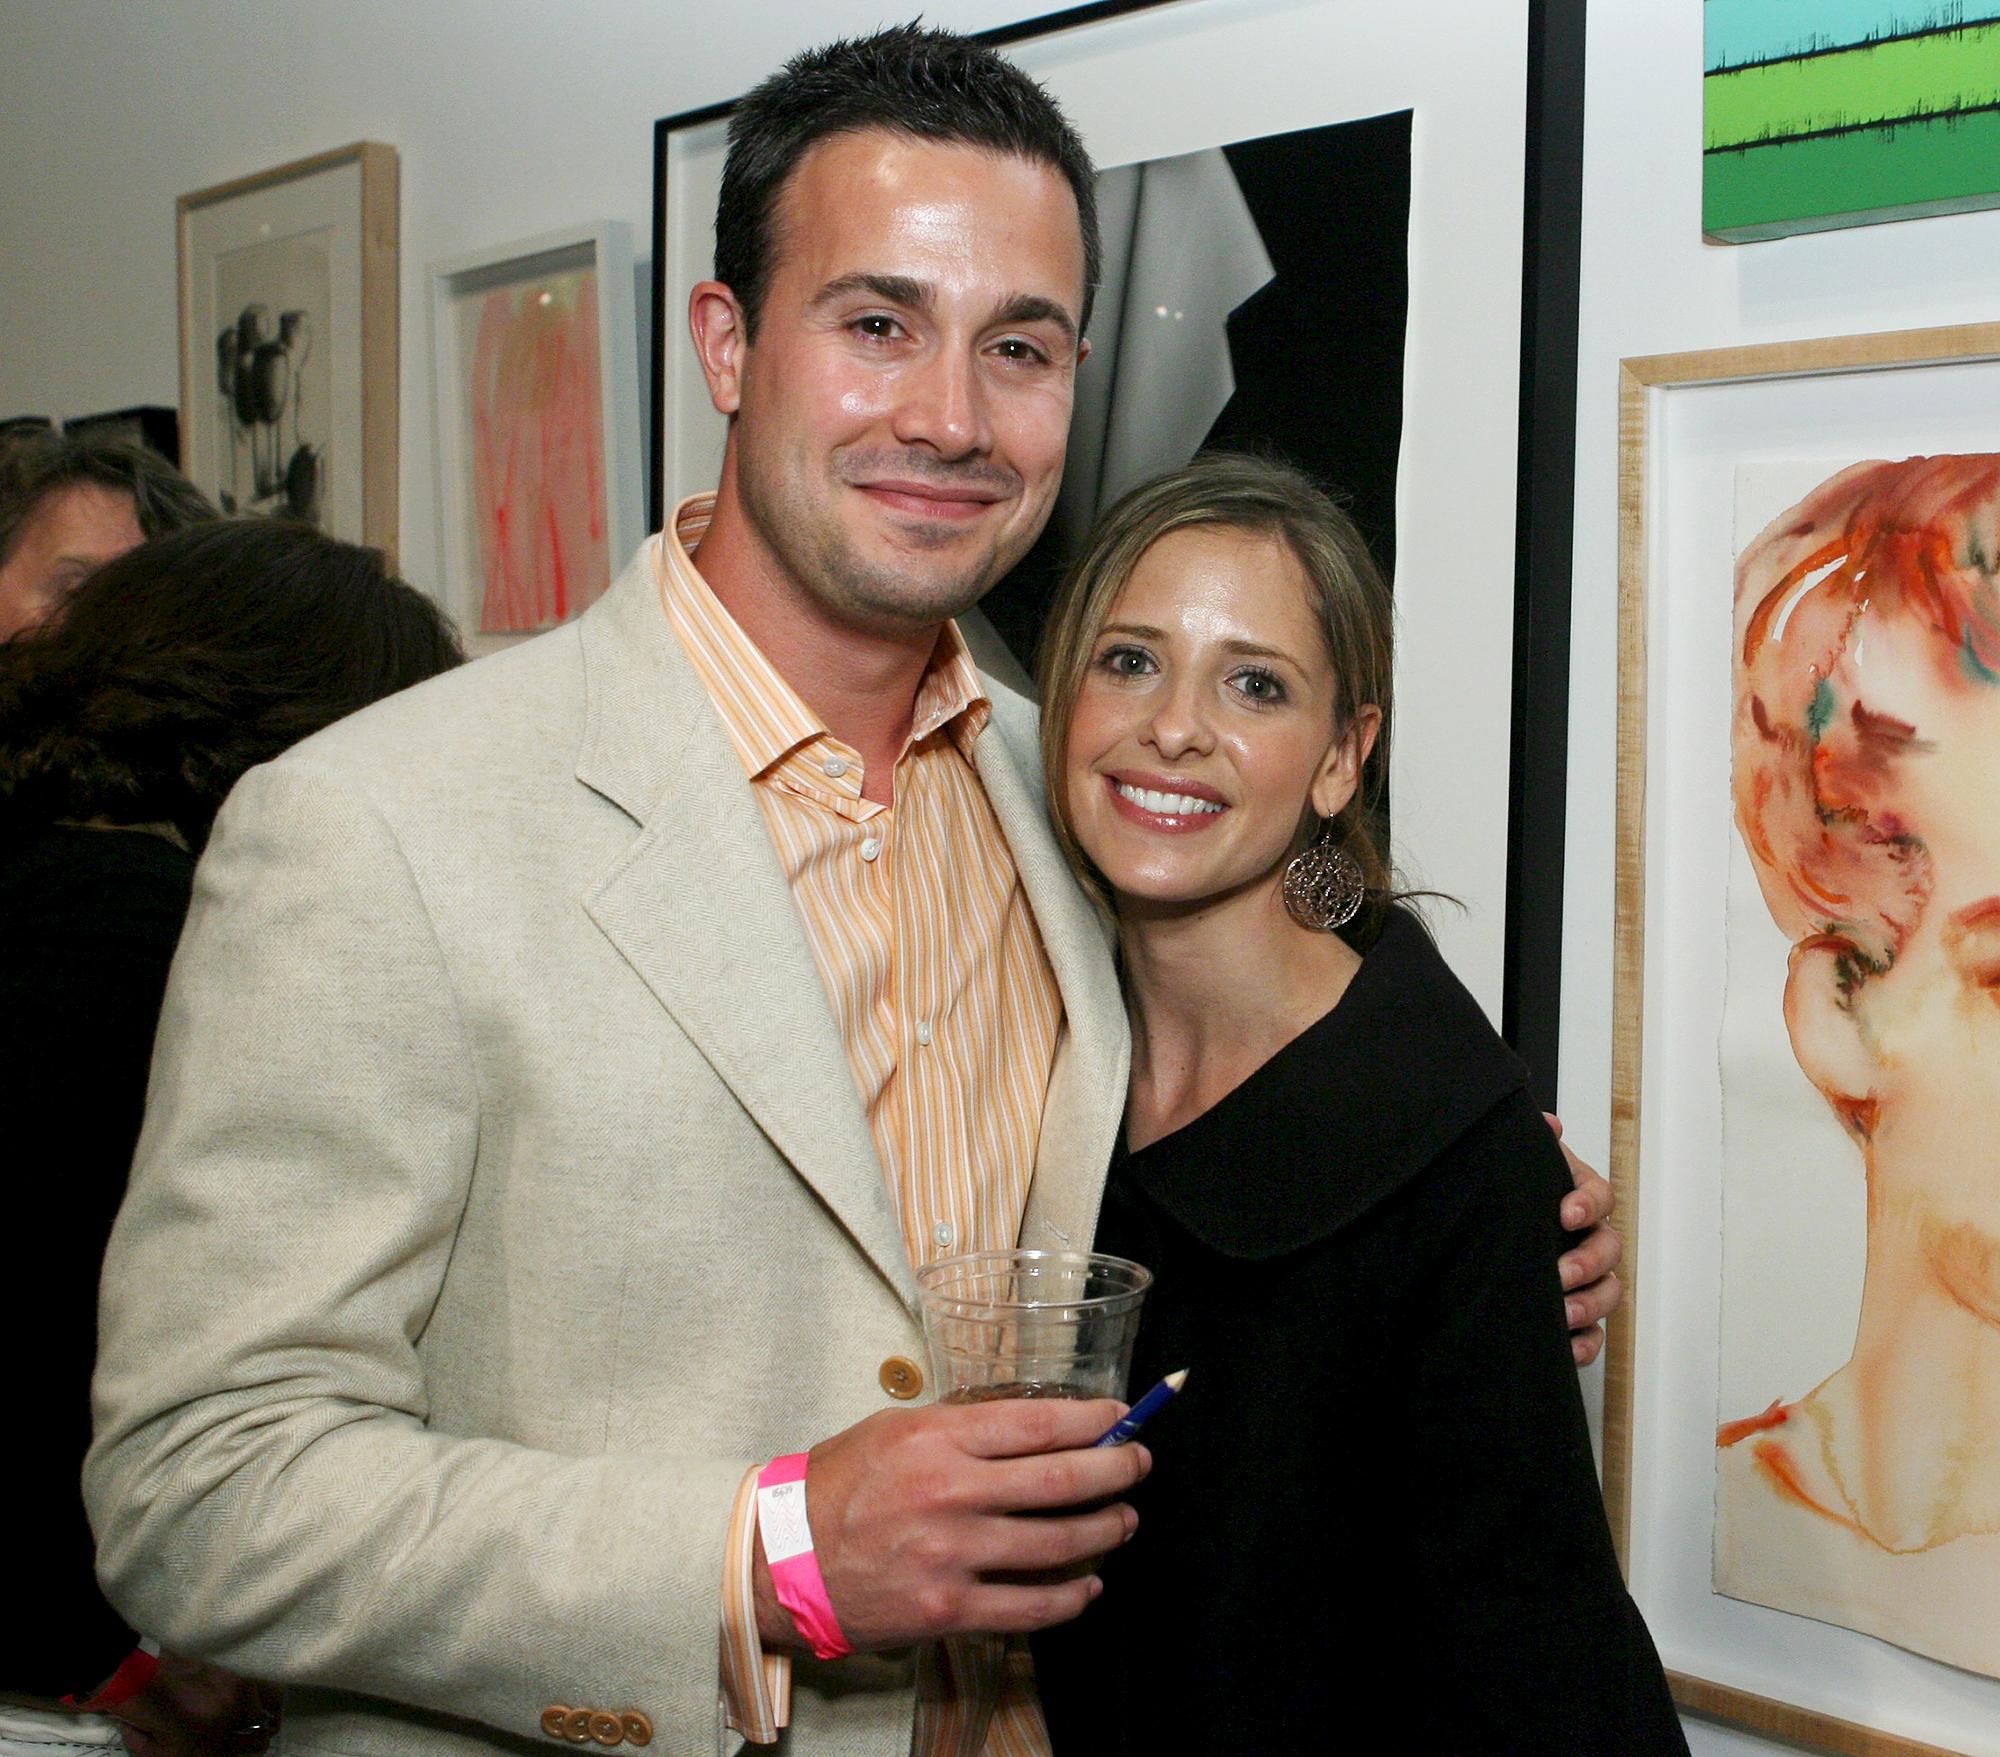 Freddie-Prinze-Jr.,-Sarah-Michelle-Gellar-Disagree-About-Who-Their-Kids-Look-Like